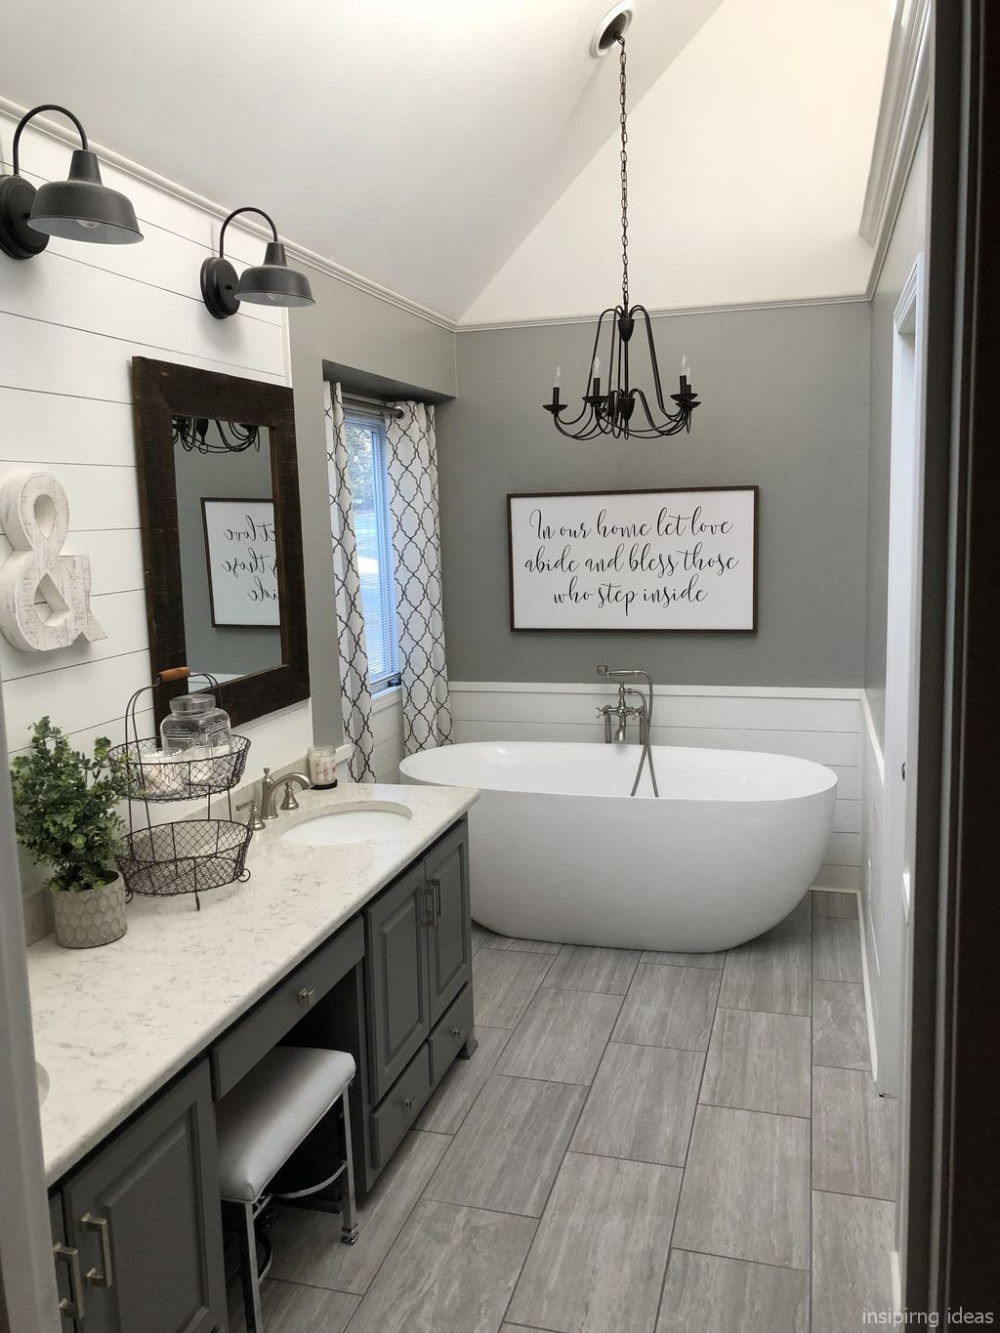 Internal Home Design Grey Bathroom Decor Pinterest Bathroom Decor Design Gre Bathroo In 2021 Bathroom Remodel Master Farmhouse Master Bathroom Farmhouse Bathroom Decor